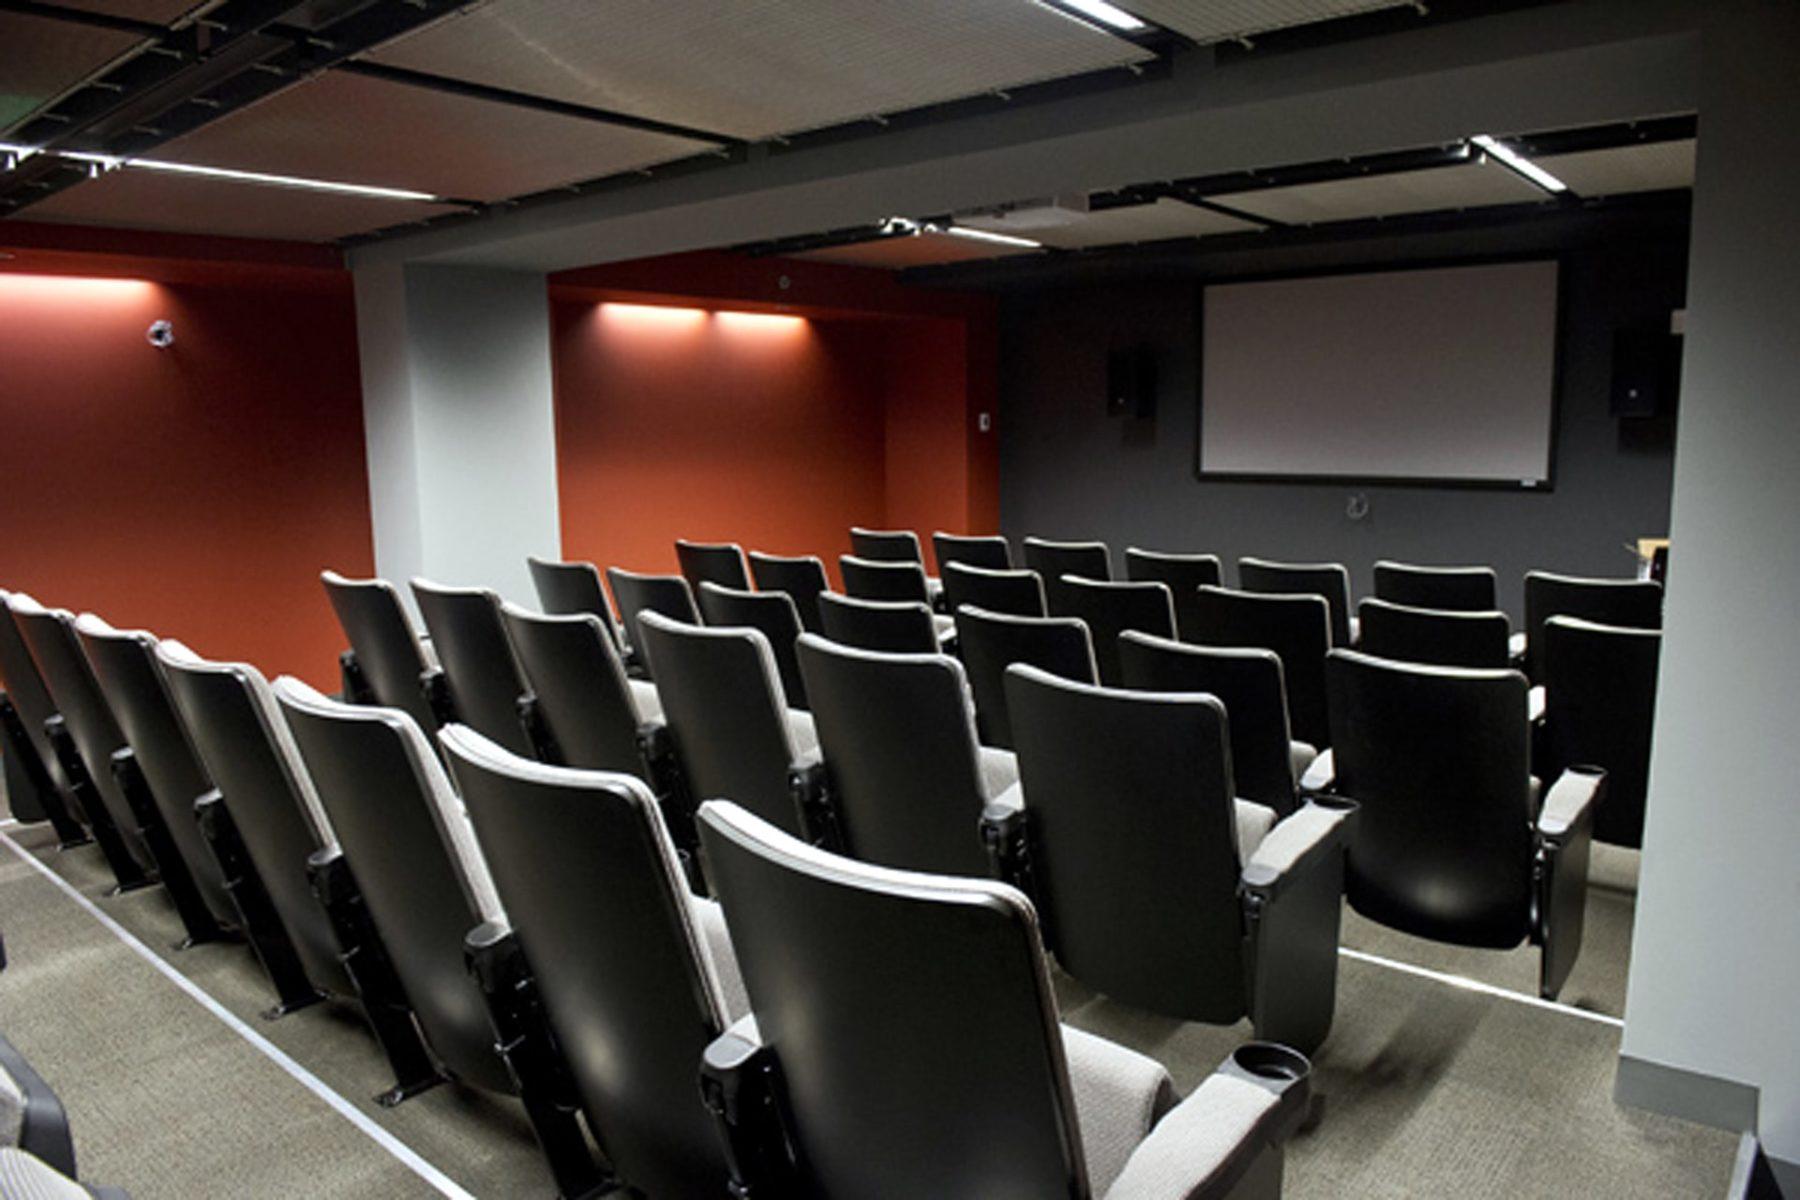 Johns Hopkins University Wolman Hall Common Space Improvements